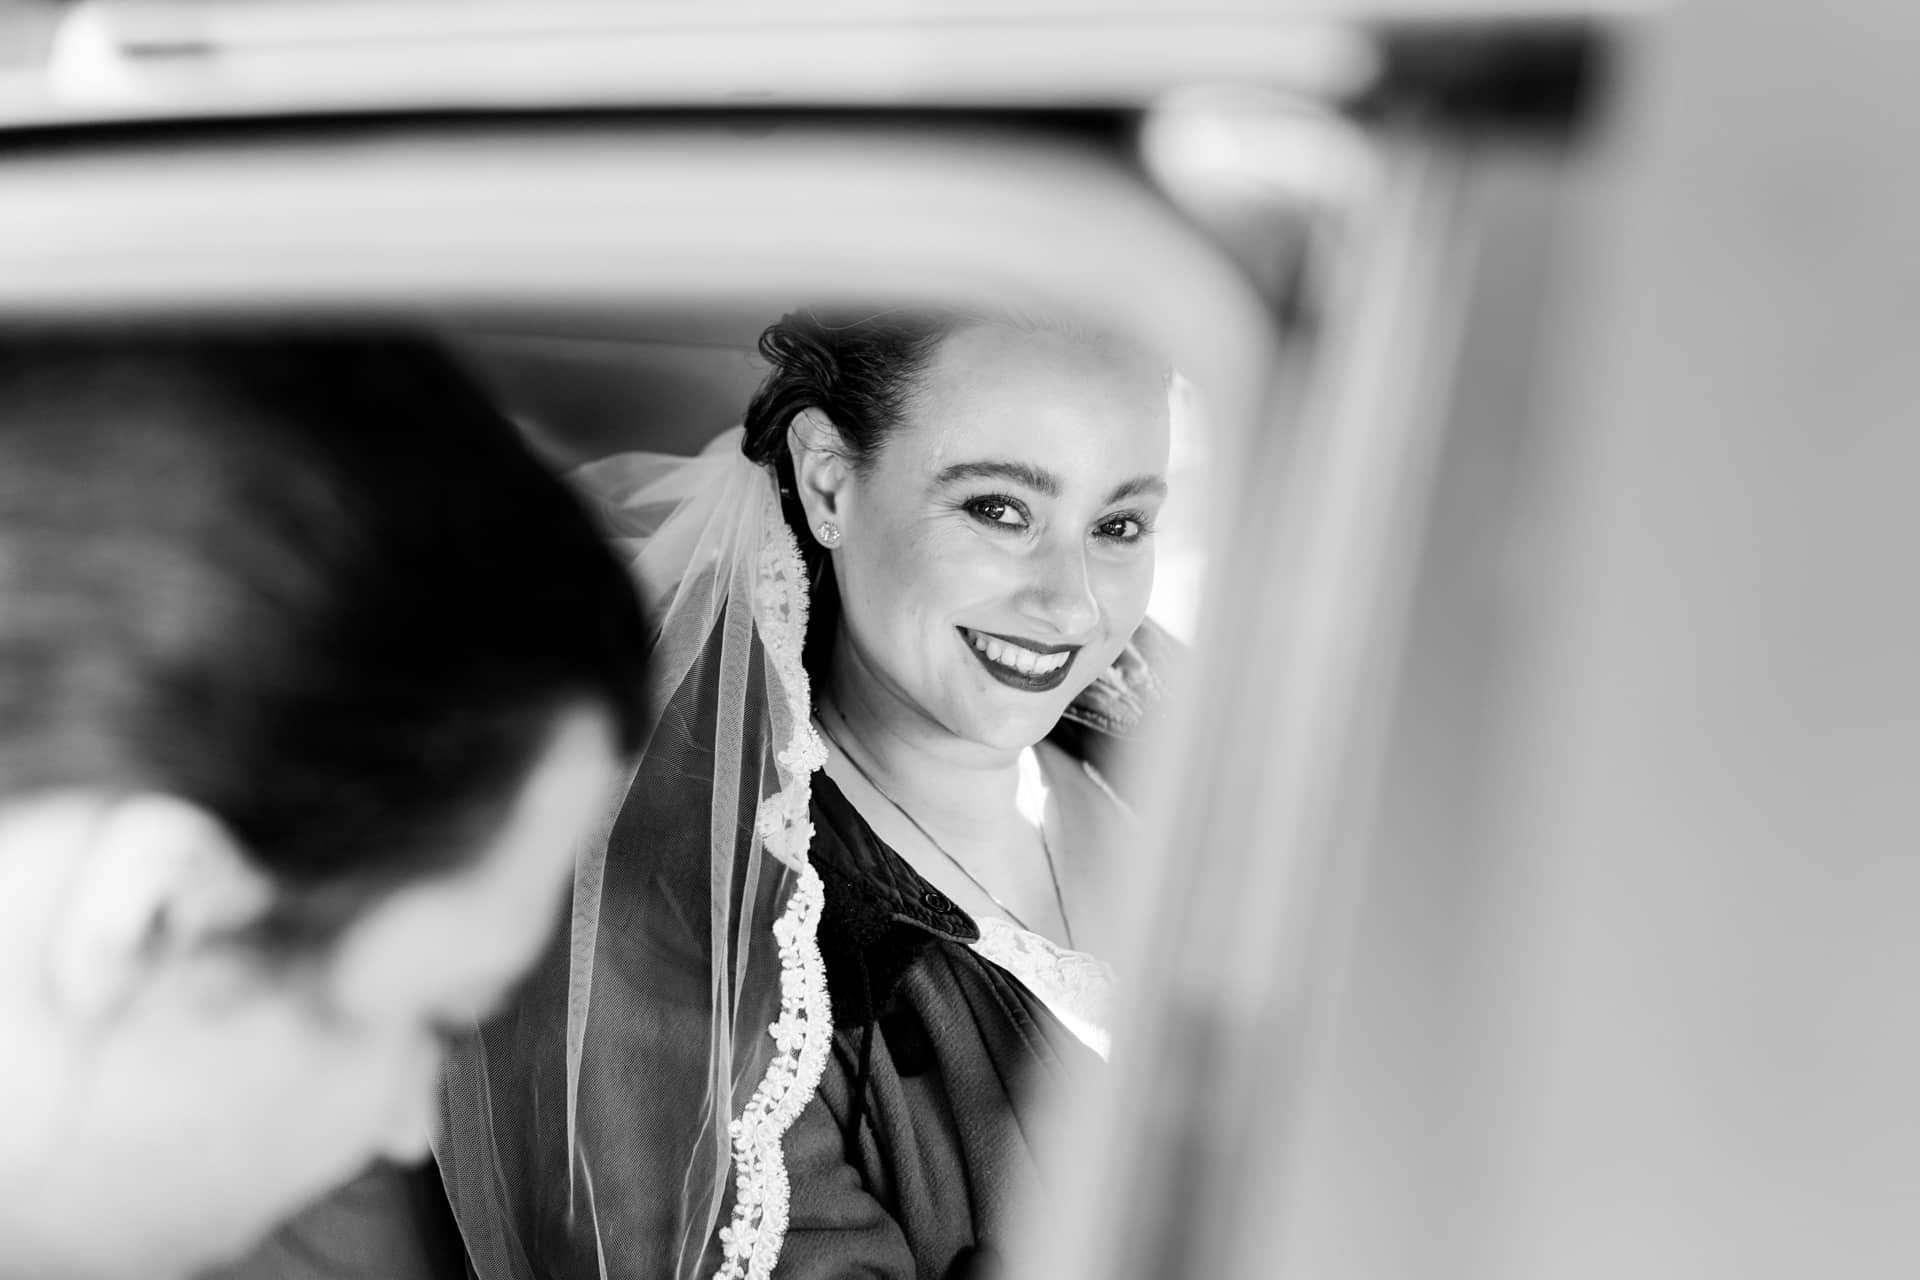 Bruid in trouwauto in zwart-wit